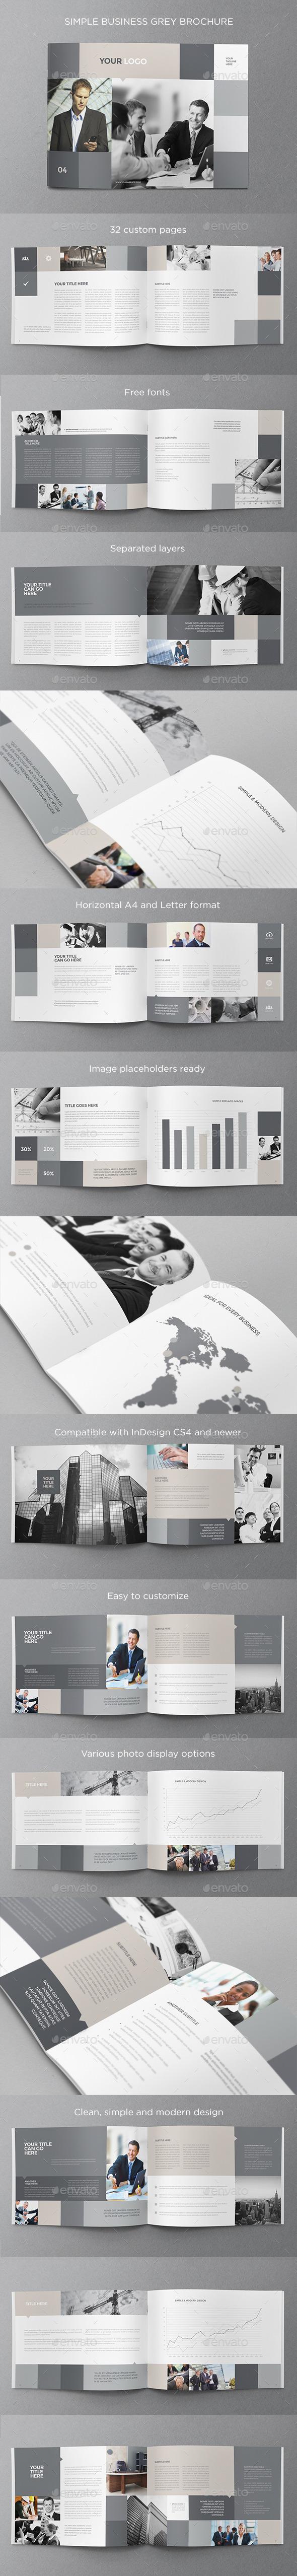 Simple Business Grey Brochure - Brochures Print Templates